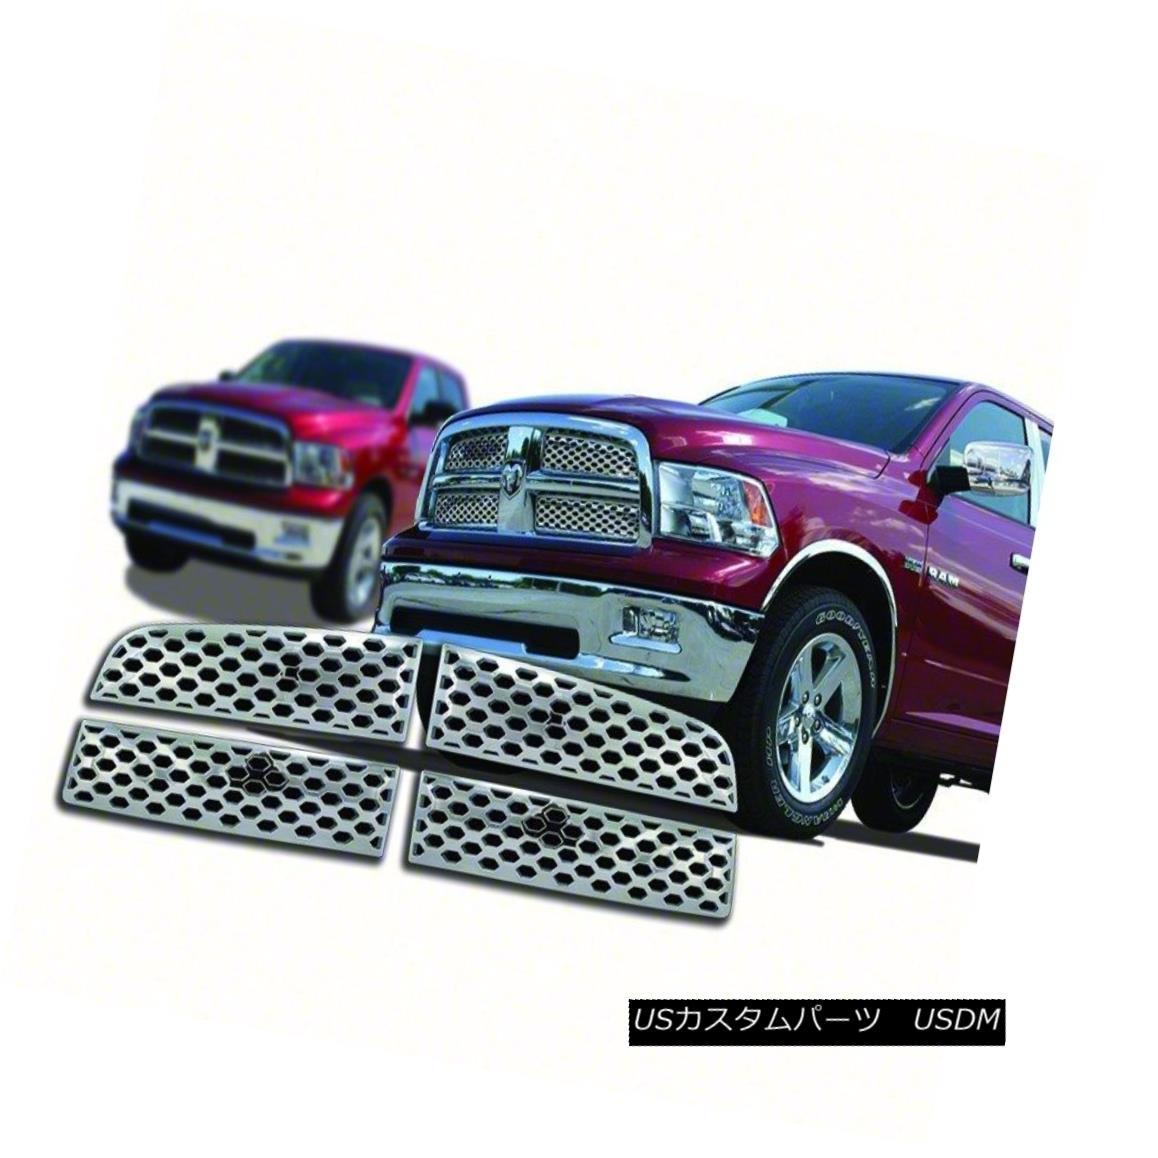 USグリル IWCGI74-Fits 2009-12 Dodge Ram 1500-4pc Chrome Grille Overlay IWCGI74-Fits 2009-12 Dodge Ram 1500-4pc Chrome Grille Overlay